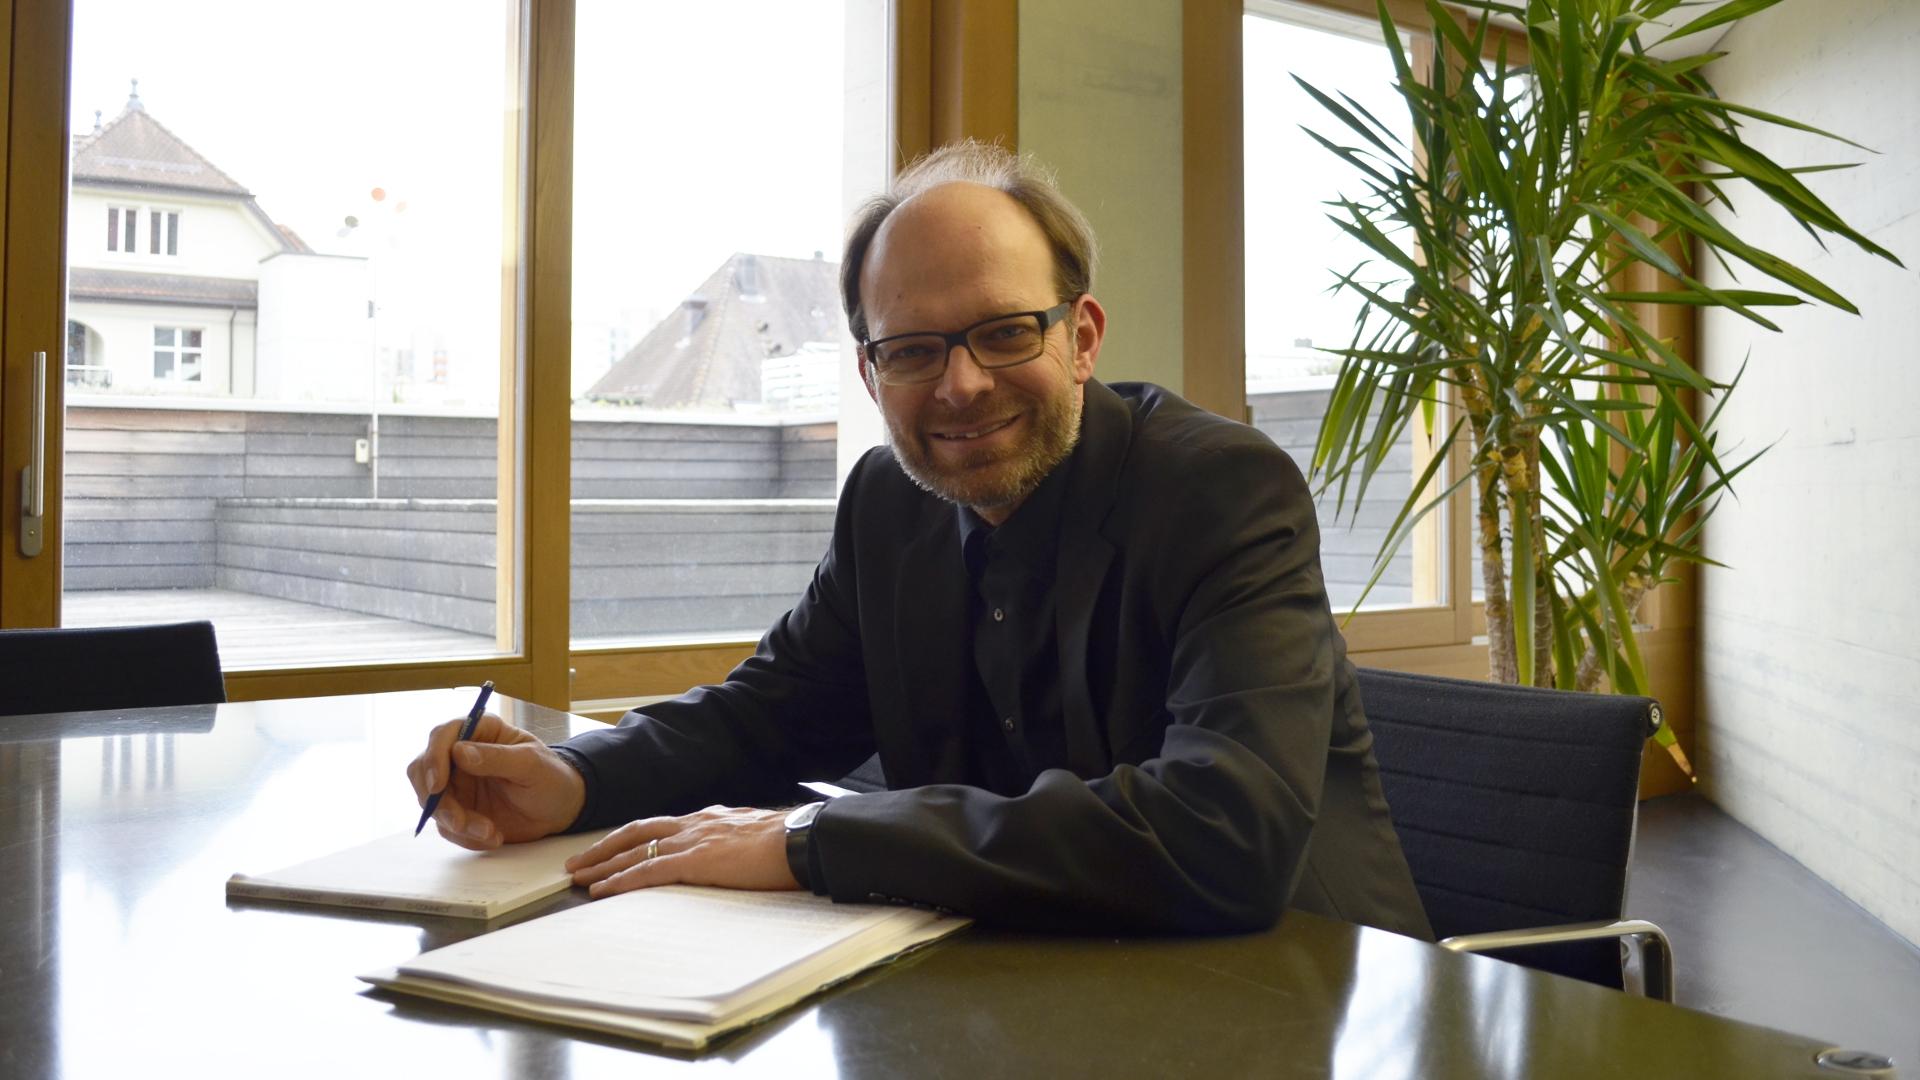 Luc Humbel in seiner Anwaltskanzlei in Brugg